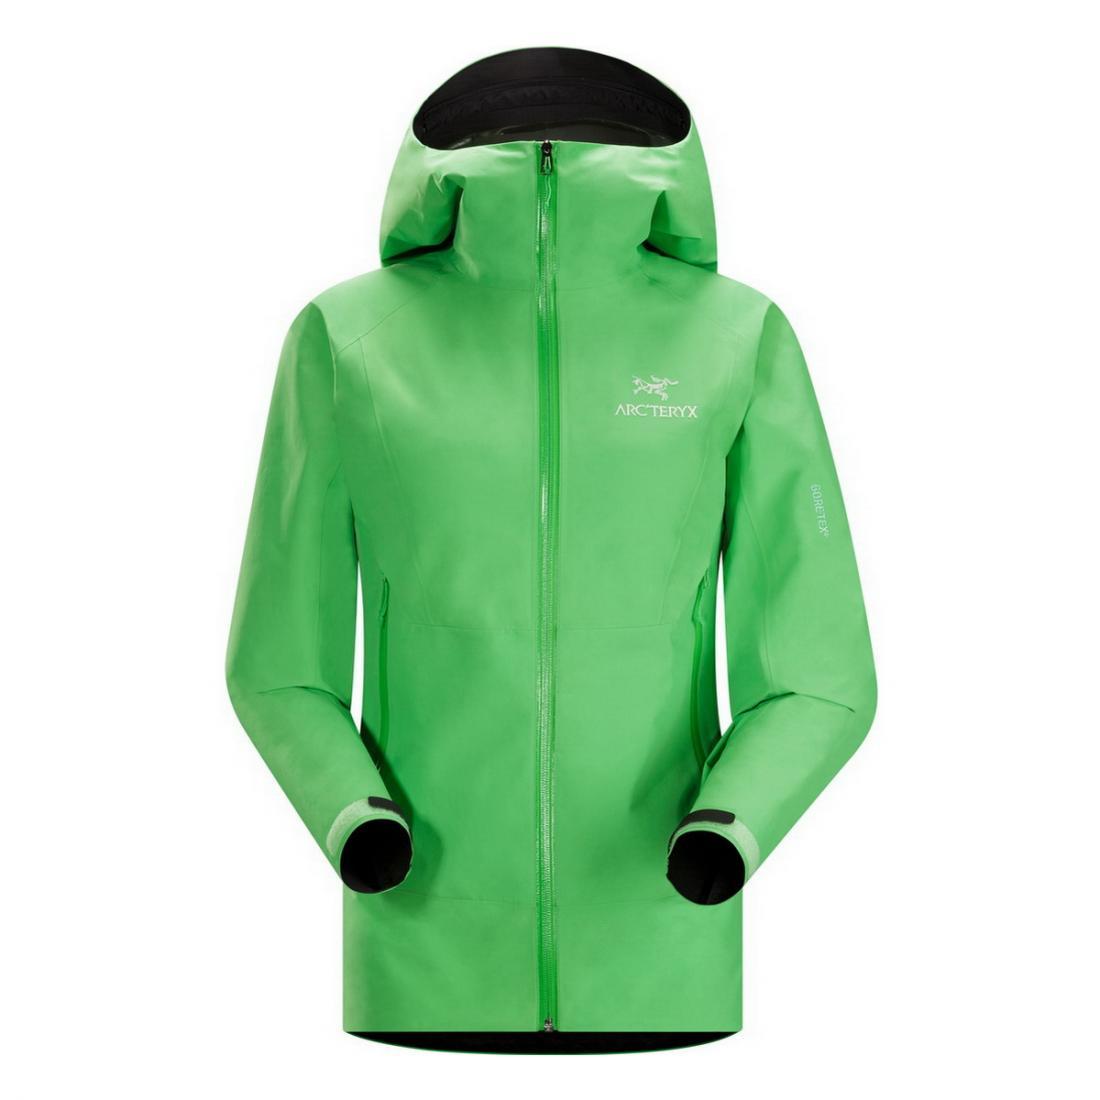 Куртка Beta SL жен.Куртки<br><br><br>Цвет: Зеленый<br>Размер: L